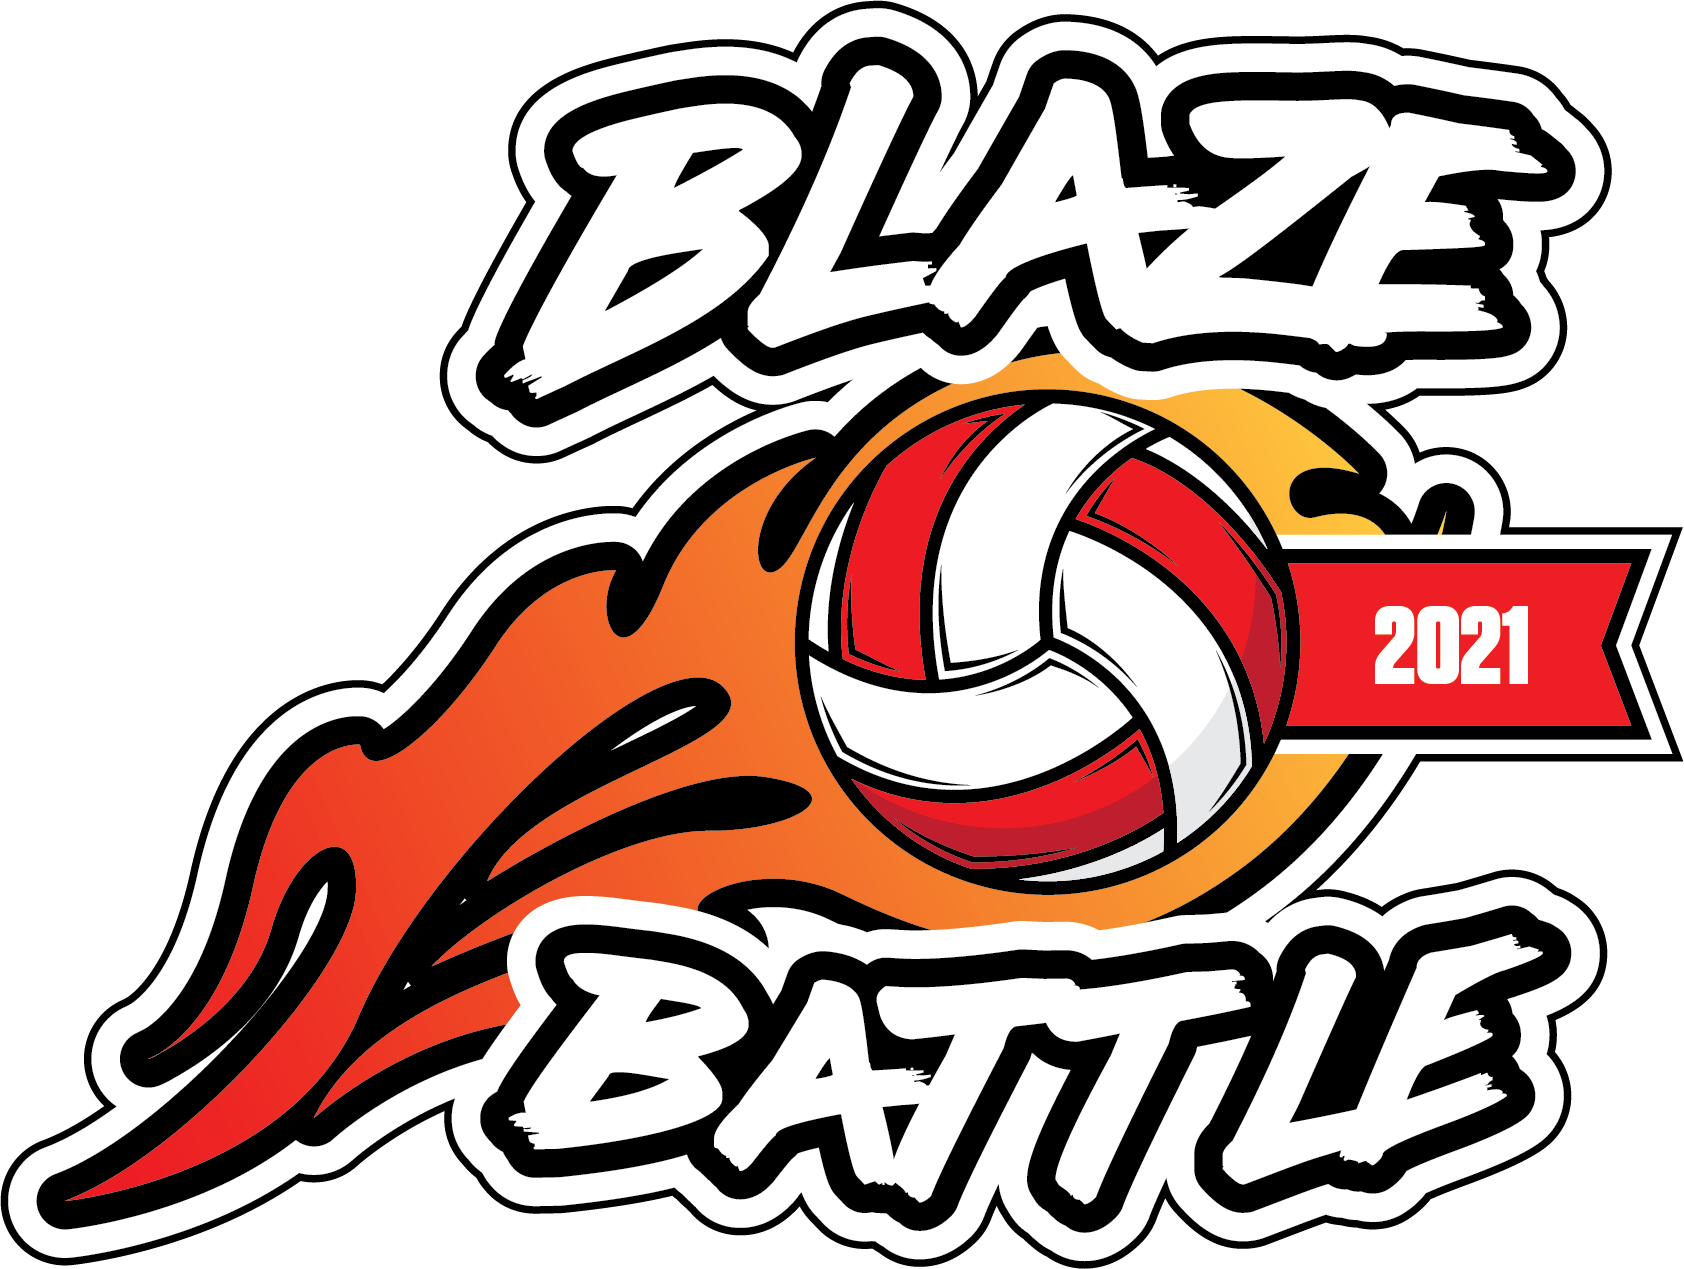 Blaze Battle 2021 Logo